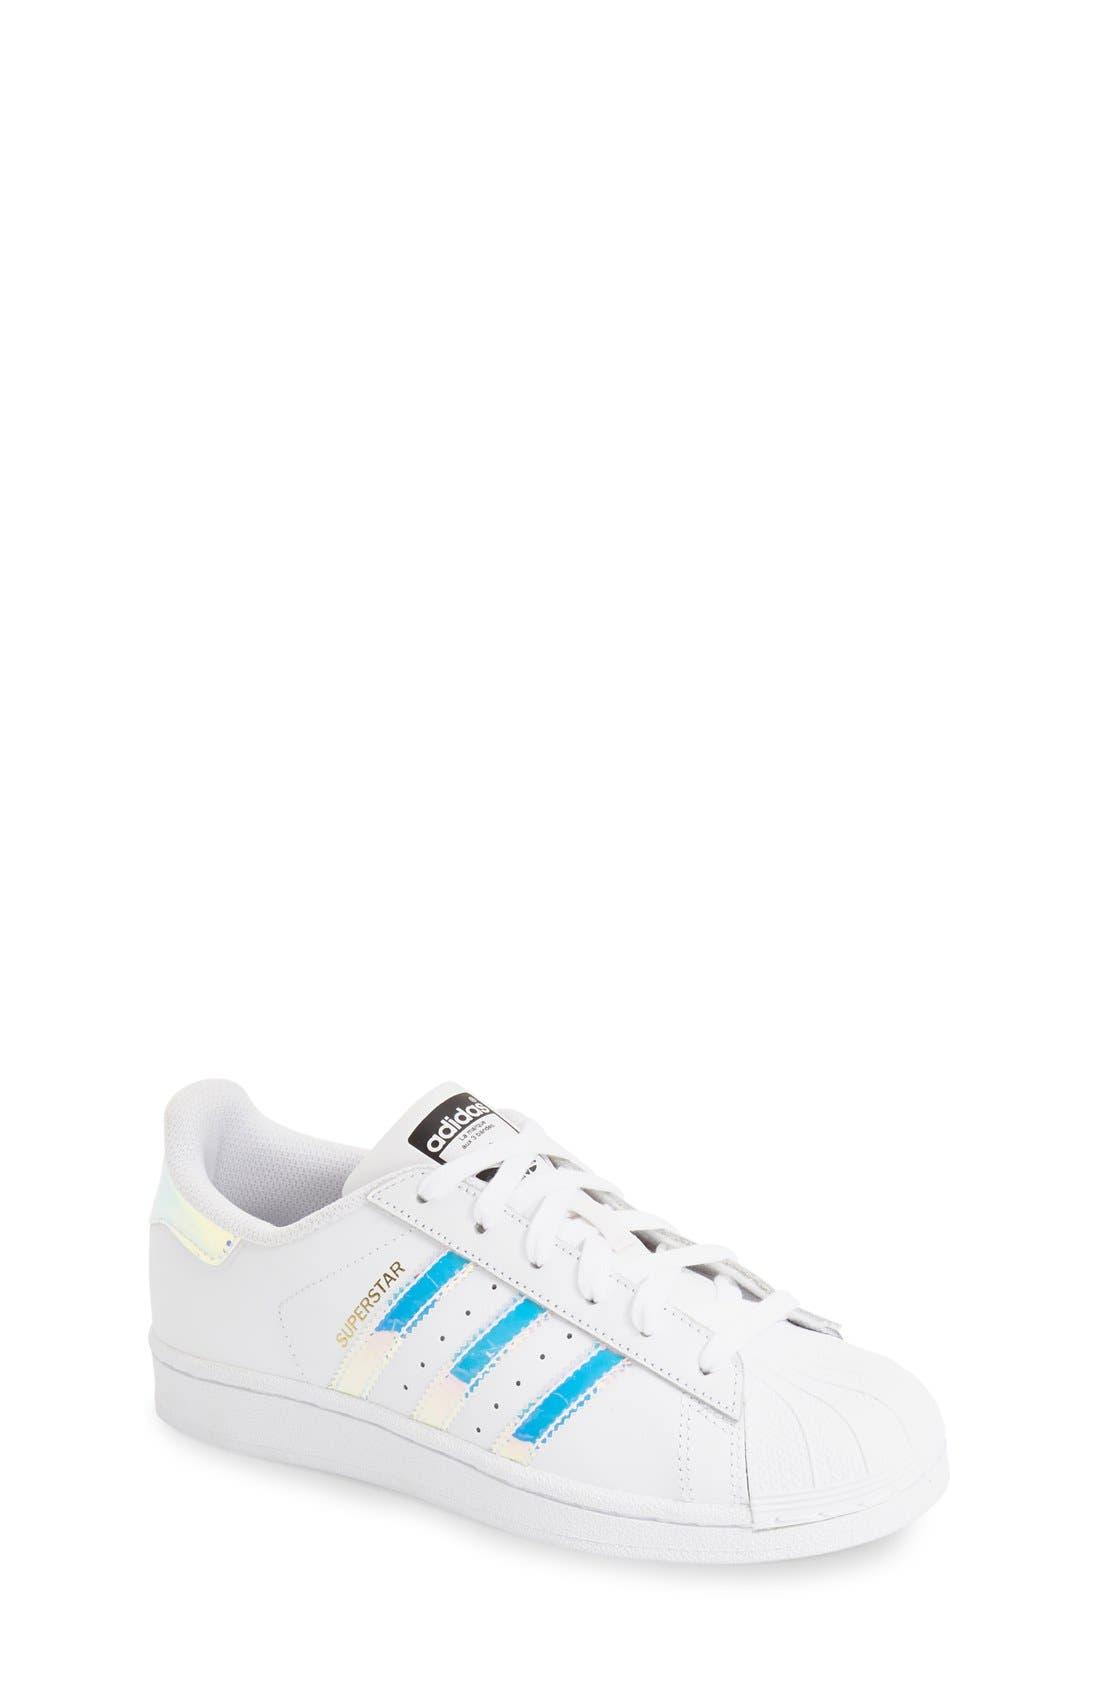 Superstar - Iridescent Sneaker,                             Main thumbnail 1, color,                             SILVER METALLIC/ WHITE